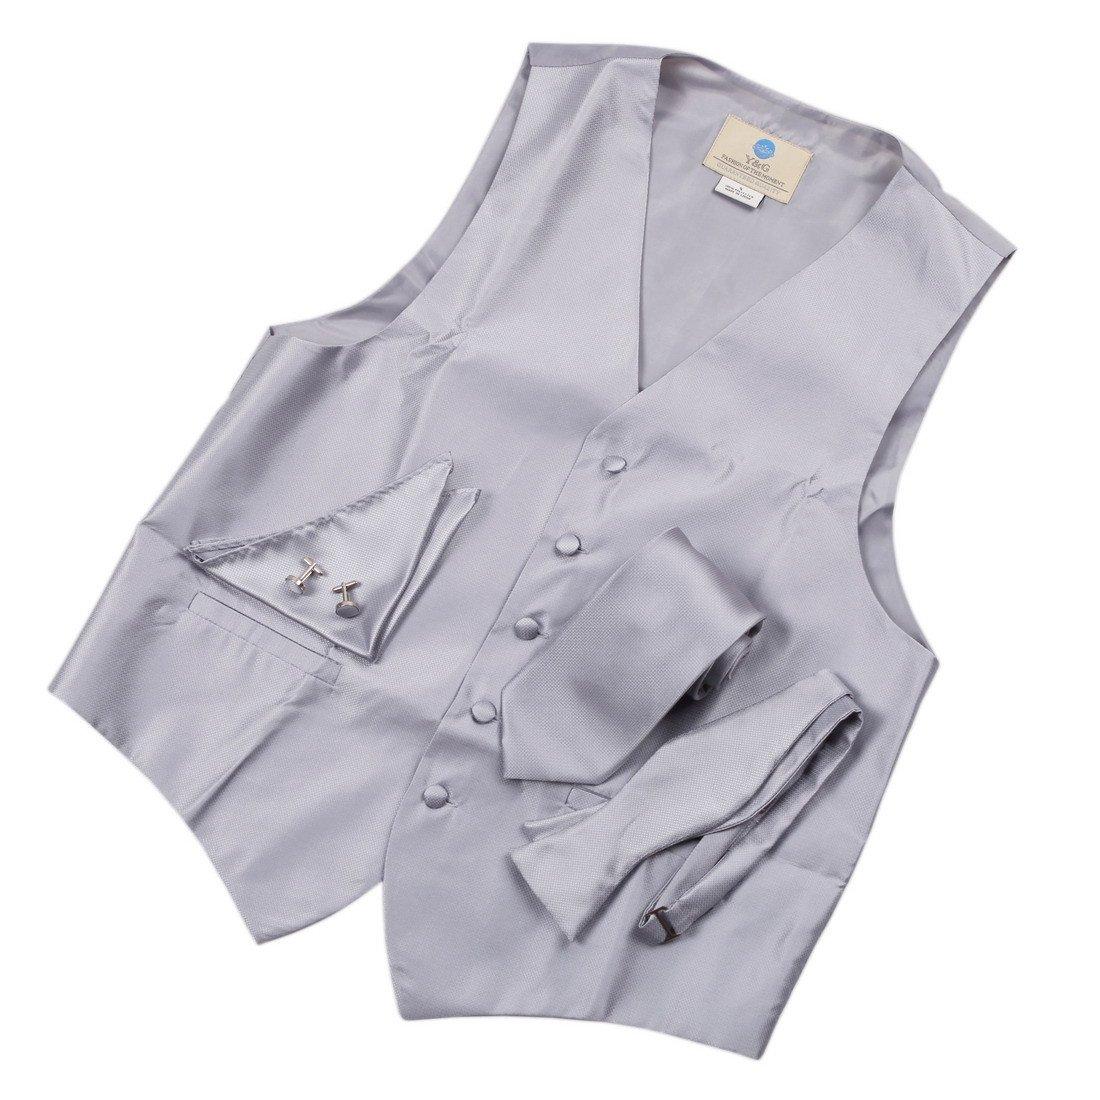 YGA1C01 Pretty Plaid Mens Vest Tie Cufflinks Hanky Bowtie Great Goods By Y& G